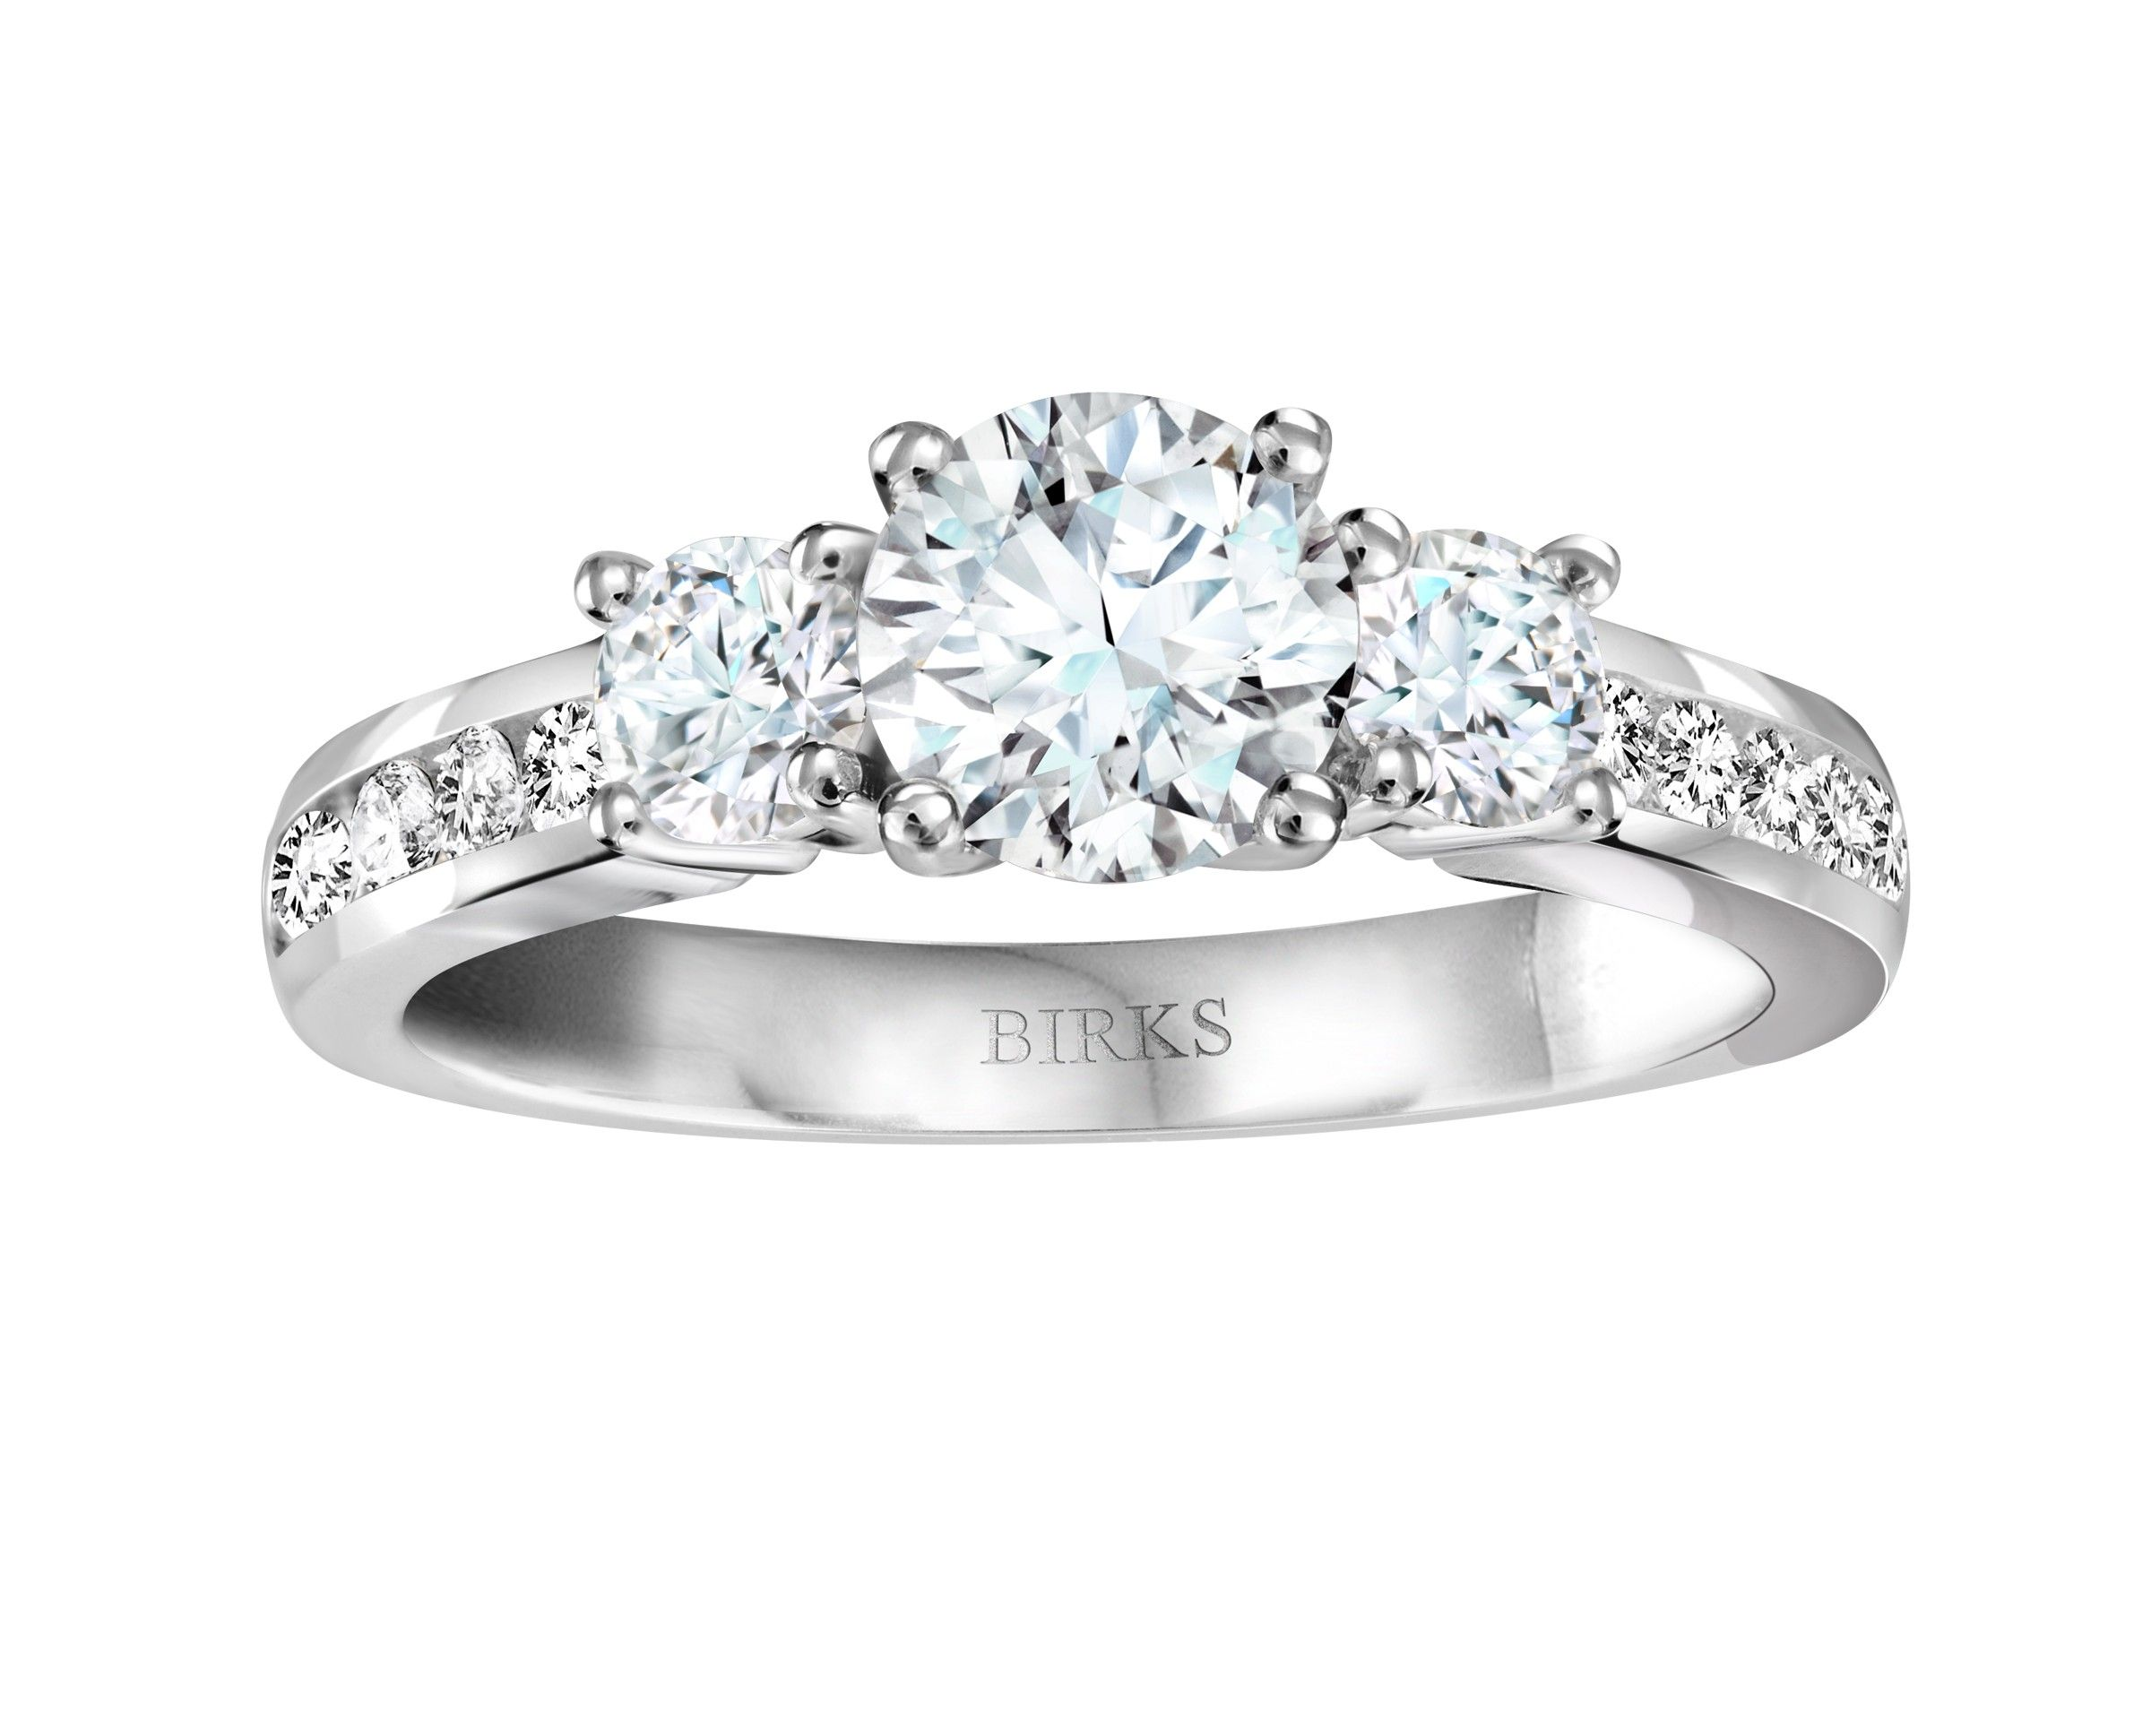 Birks Blue 3 Stone Channel Canadian Diamond Engagement Ring Canadian Diamond Engagement Ring Morganite Engagement Ring Set Pink Morganite Engagement Ring